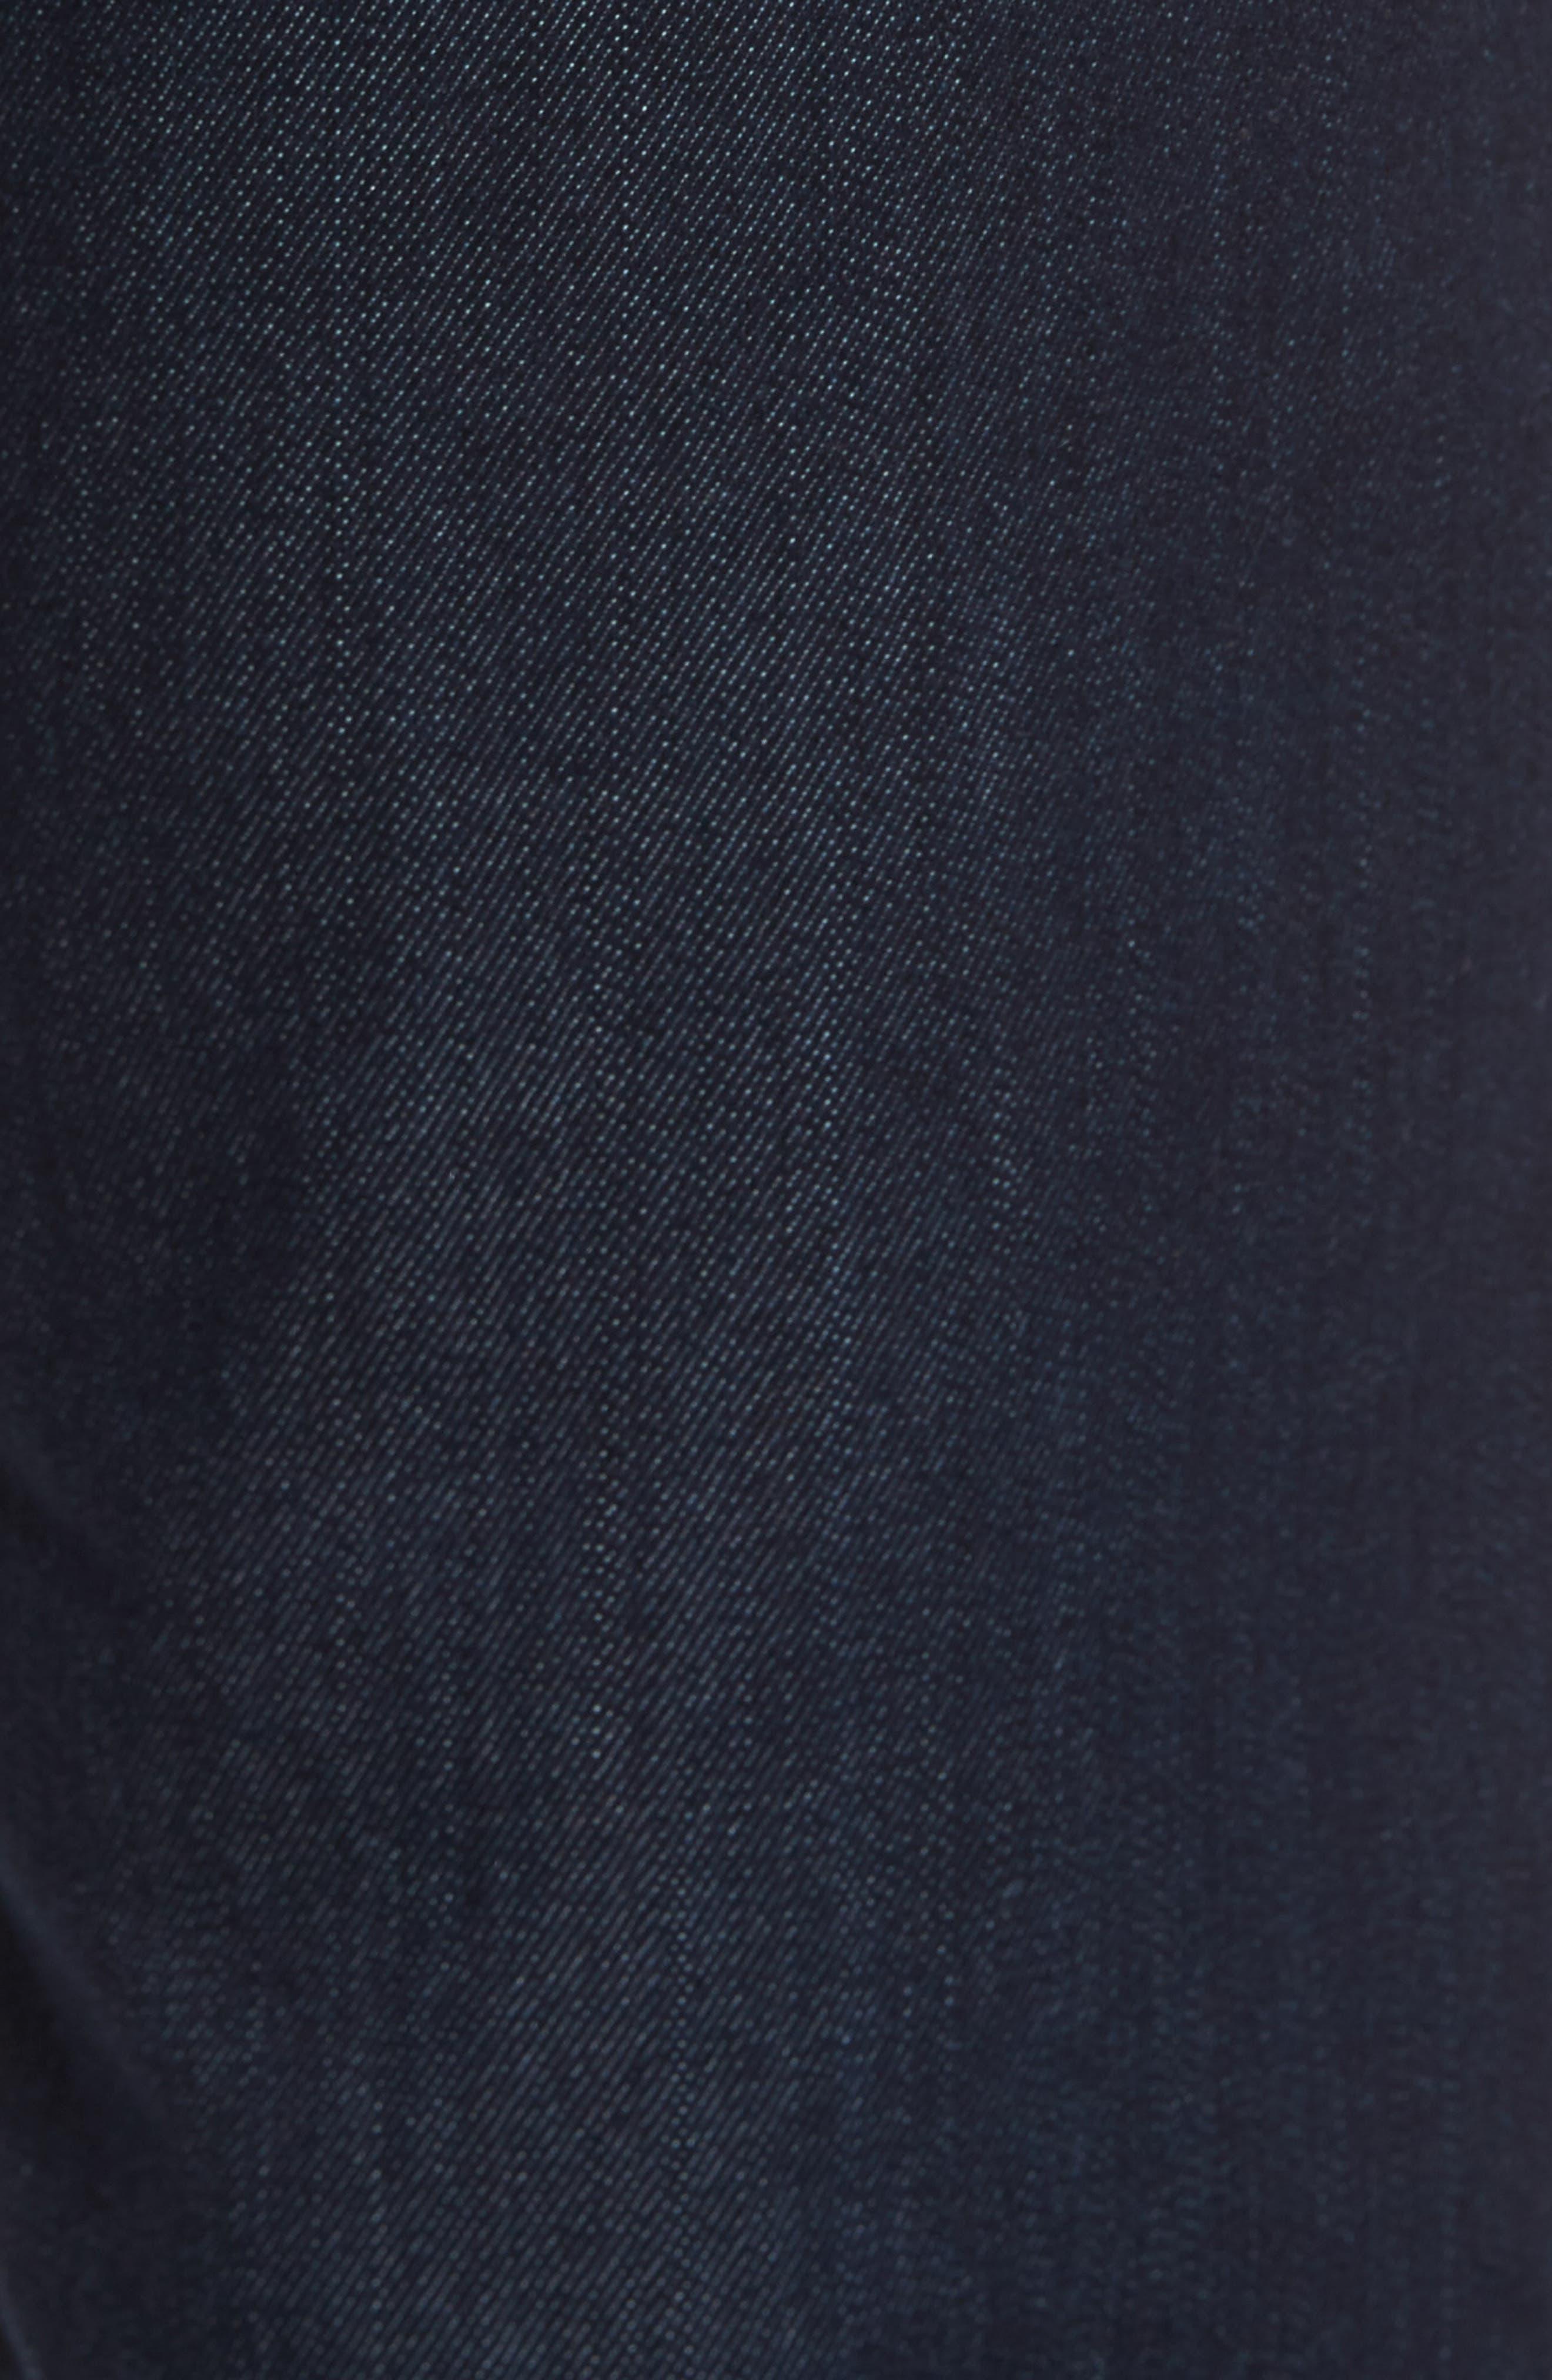 Courage Straight Leg Jeans,                             Alternate thumbnail 5, color,                             RINSE VINTAGE